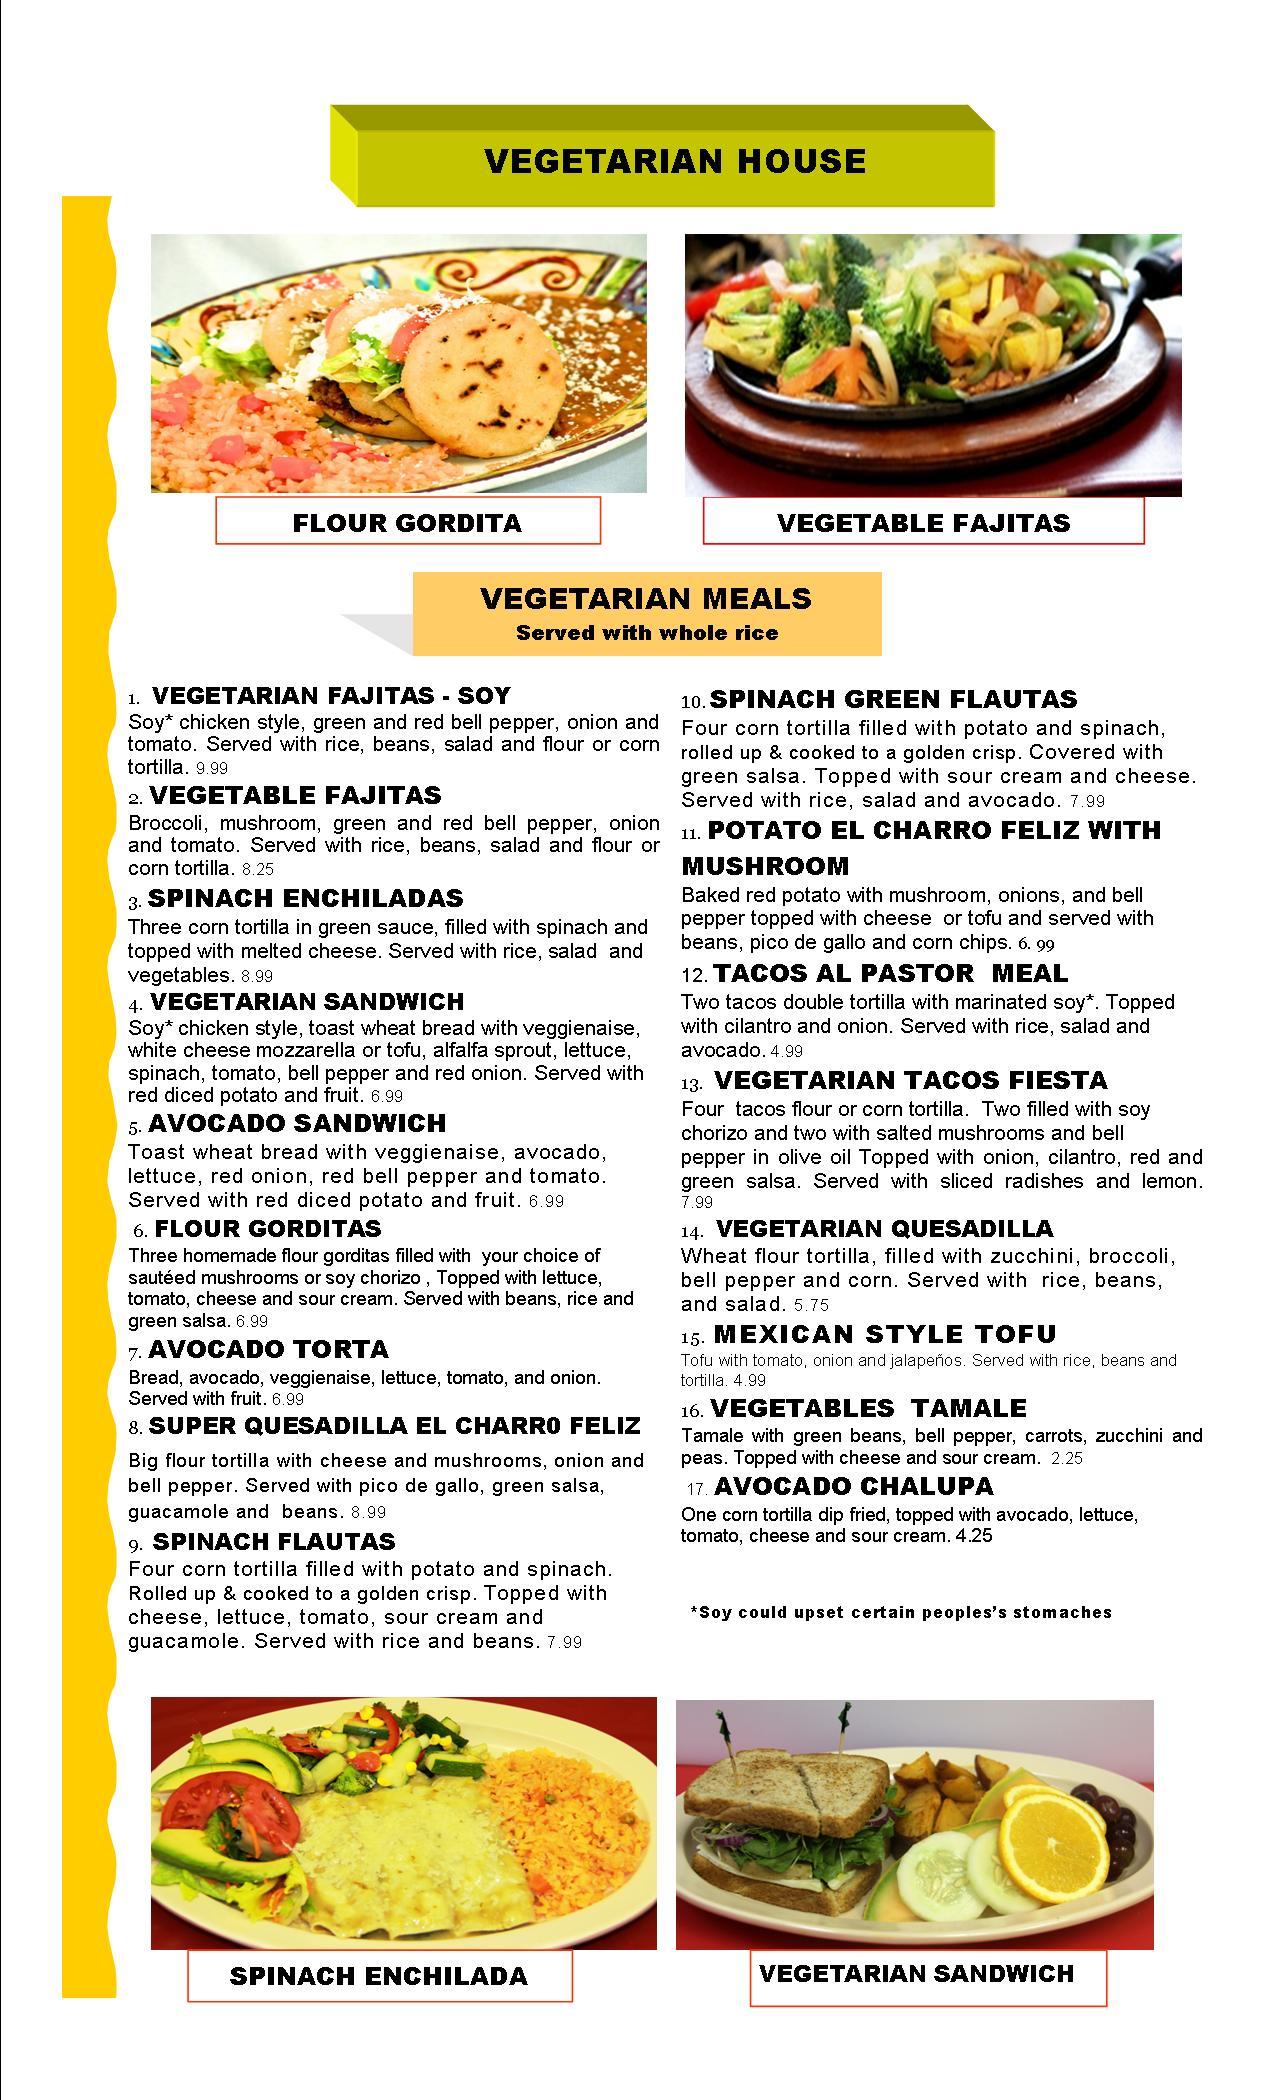 El Charro Feliz Authentic Mexican Restaurant Amp Vegetarian